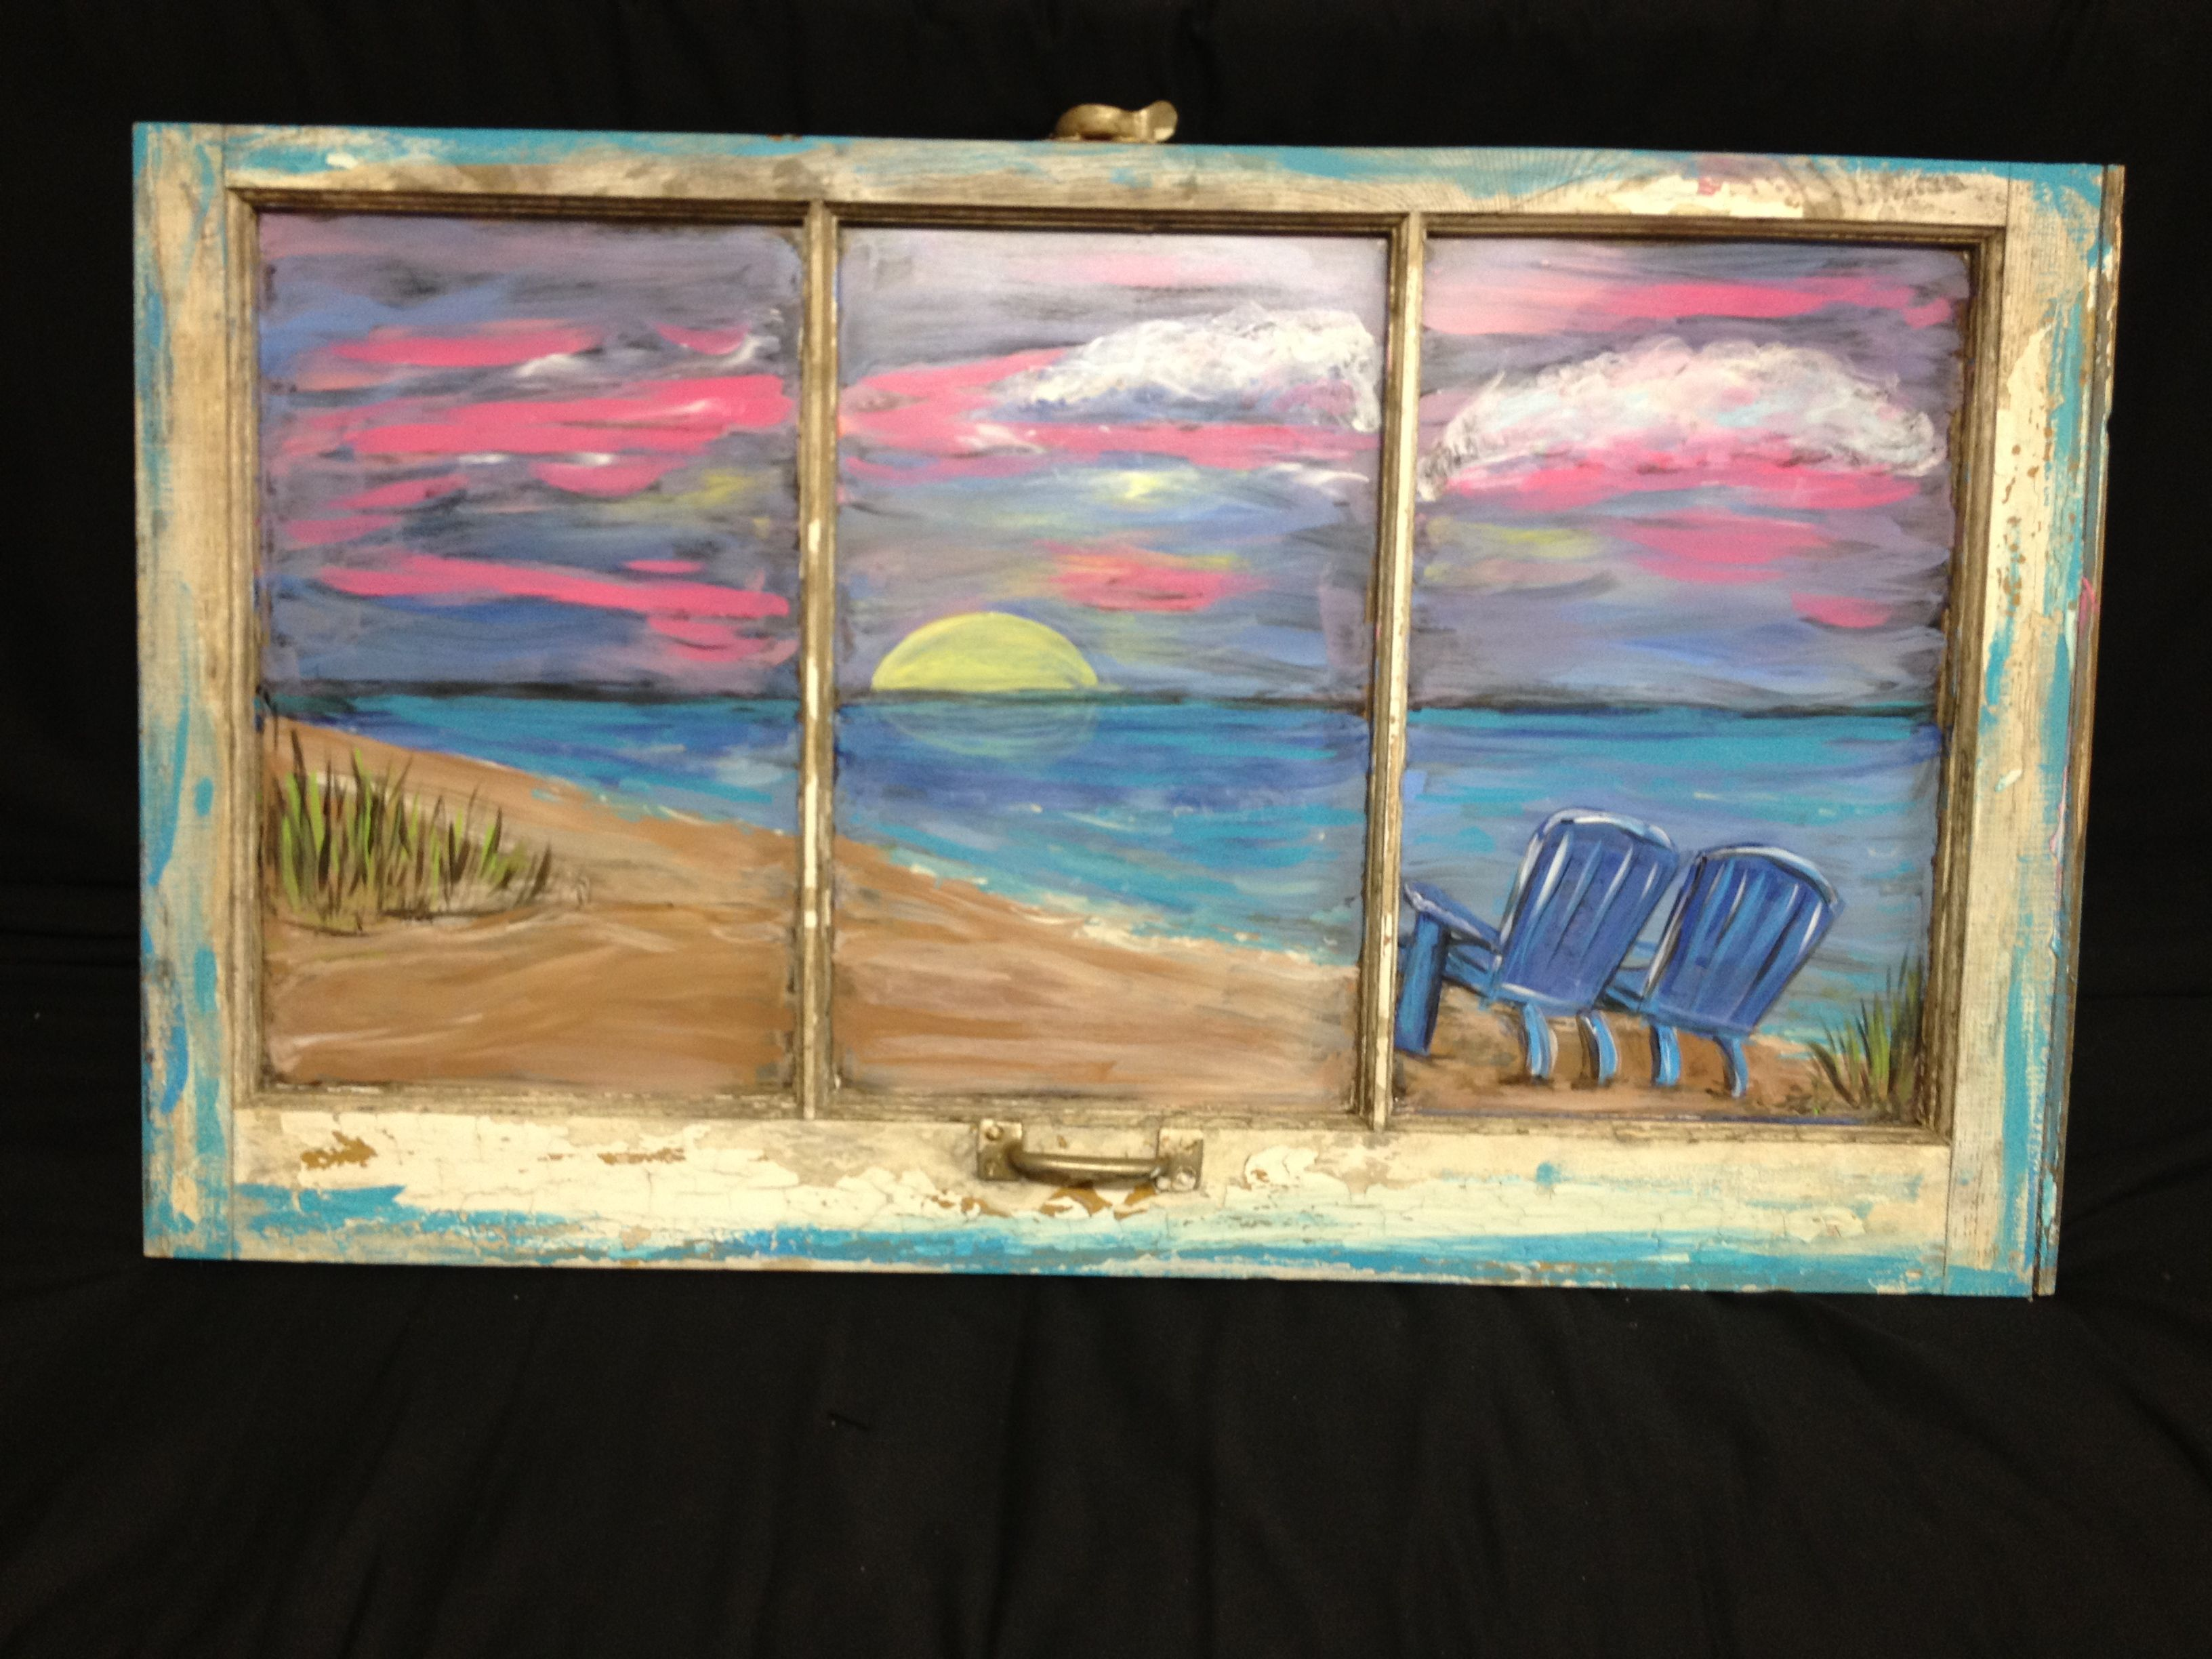 Beach Scene On A Vintage Window By Rita Clawson Window Painting Window Frame Art Window Art